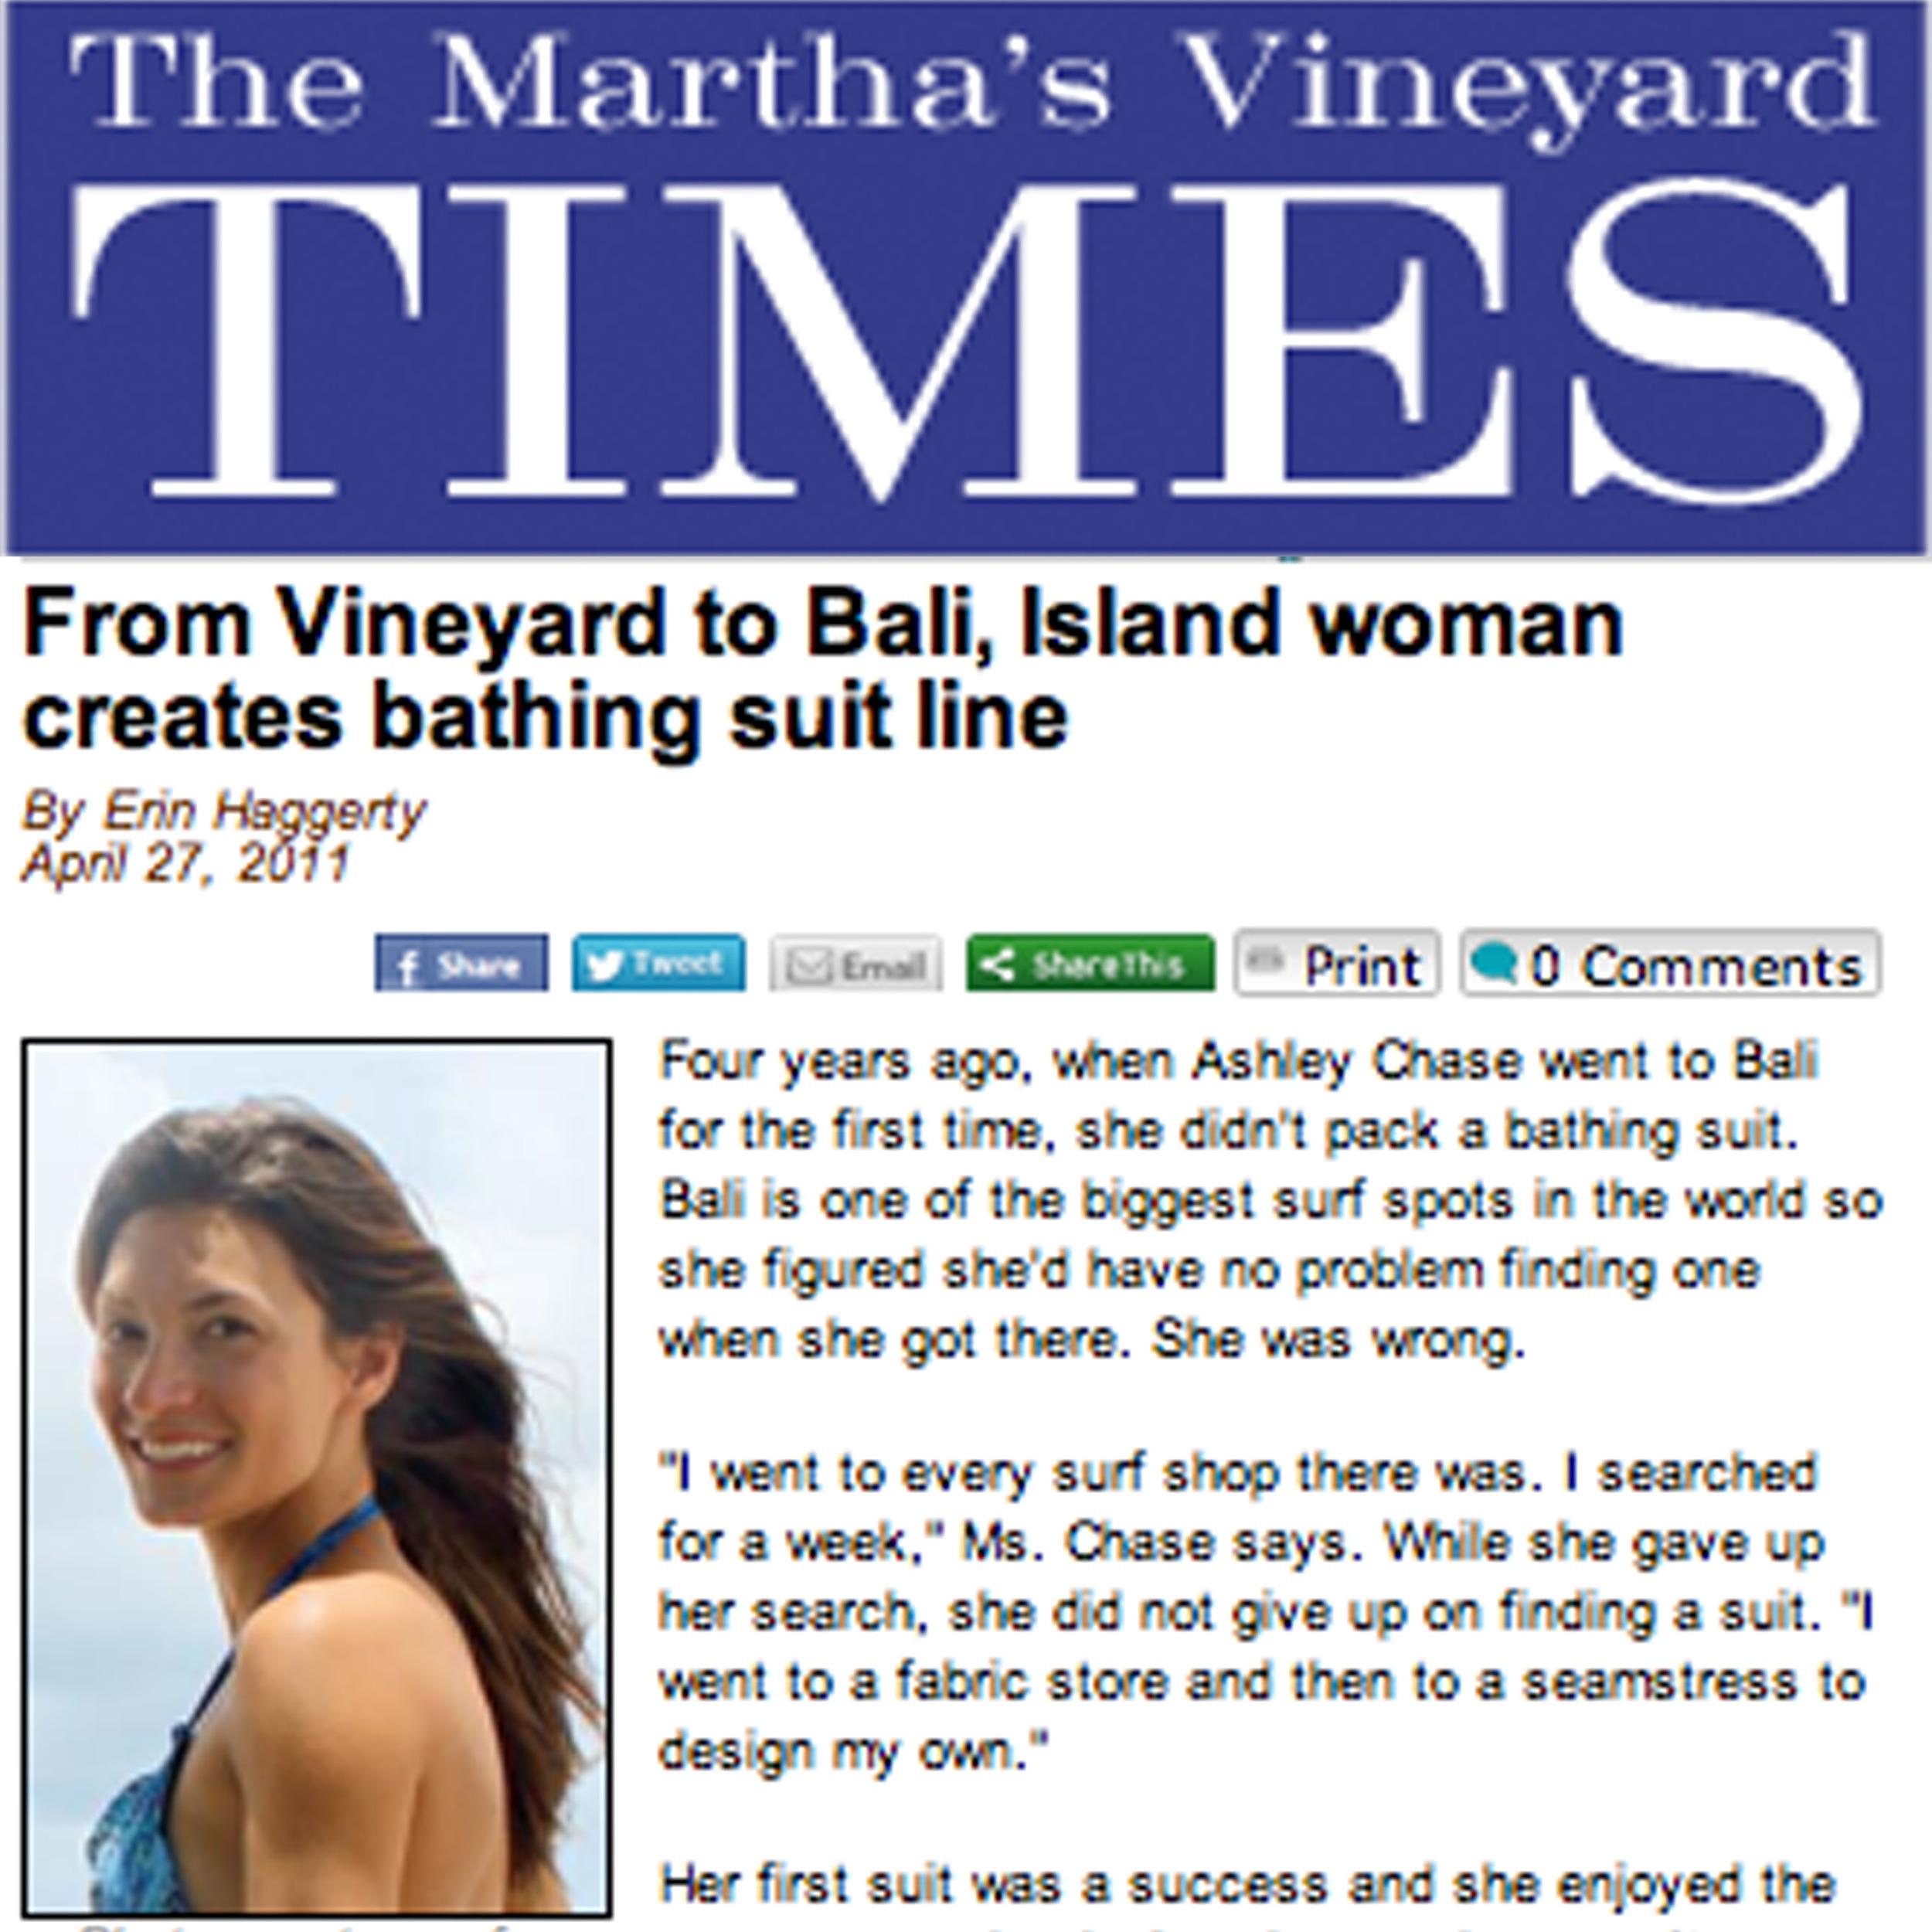 The Marthas Vineyard Times, Bali based swimwear line